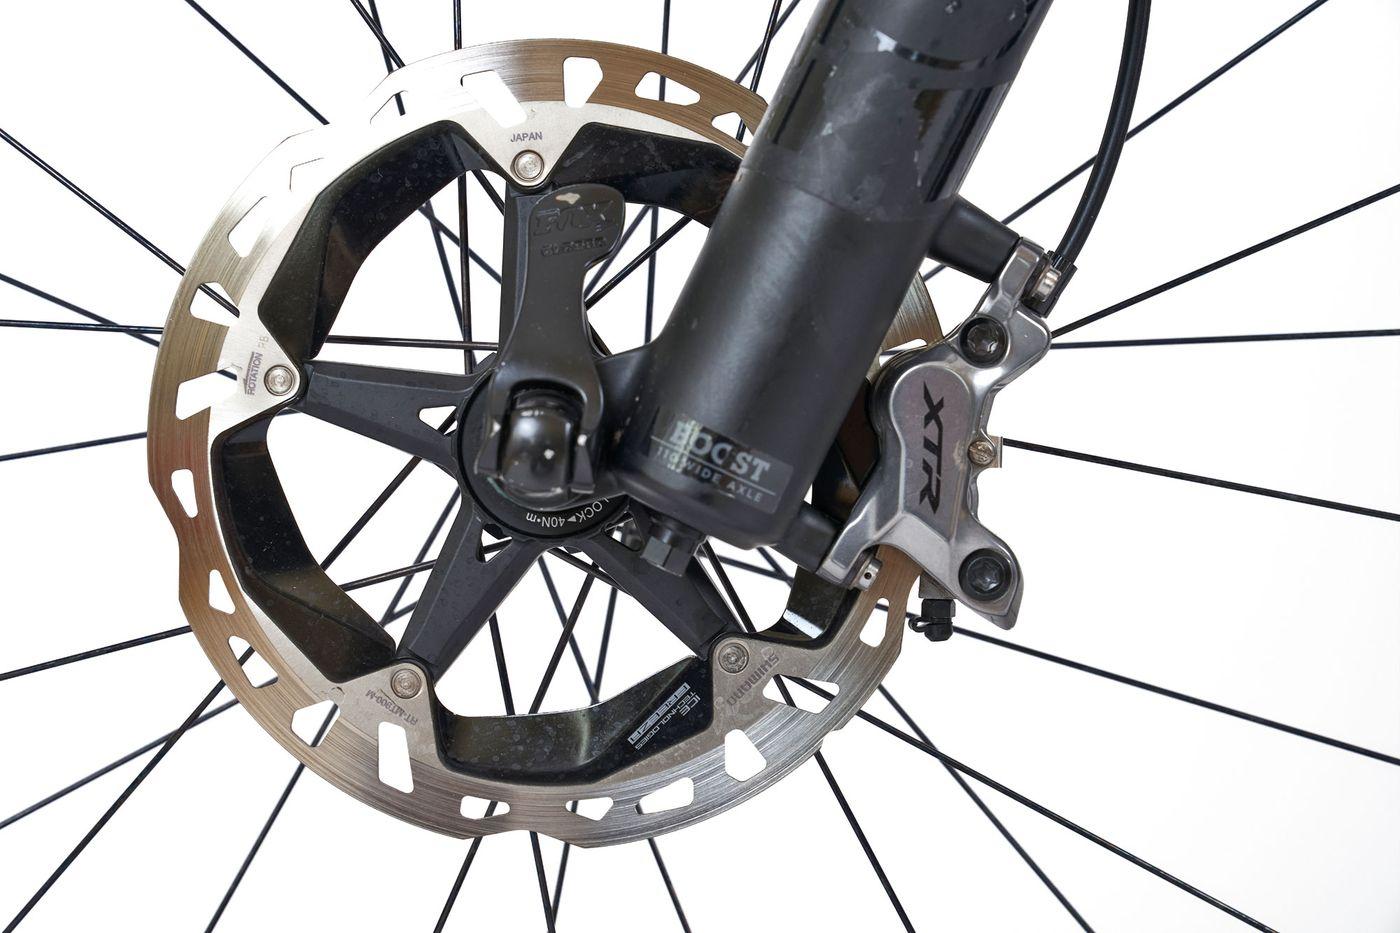 Orbea Occam M10 - Shimano XTR Trail Bremse